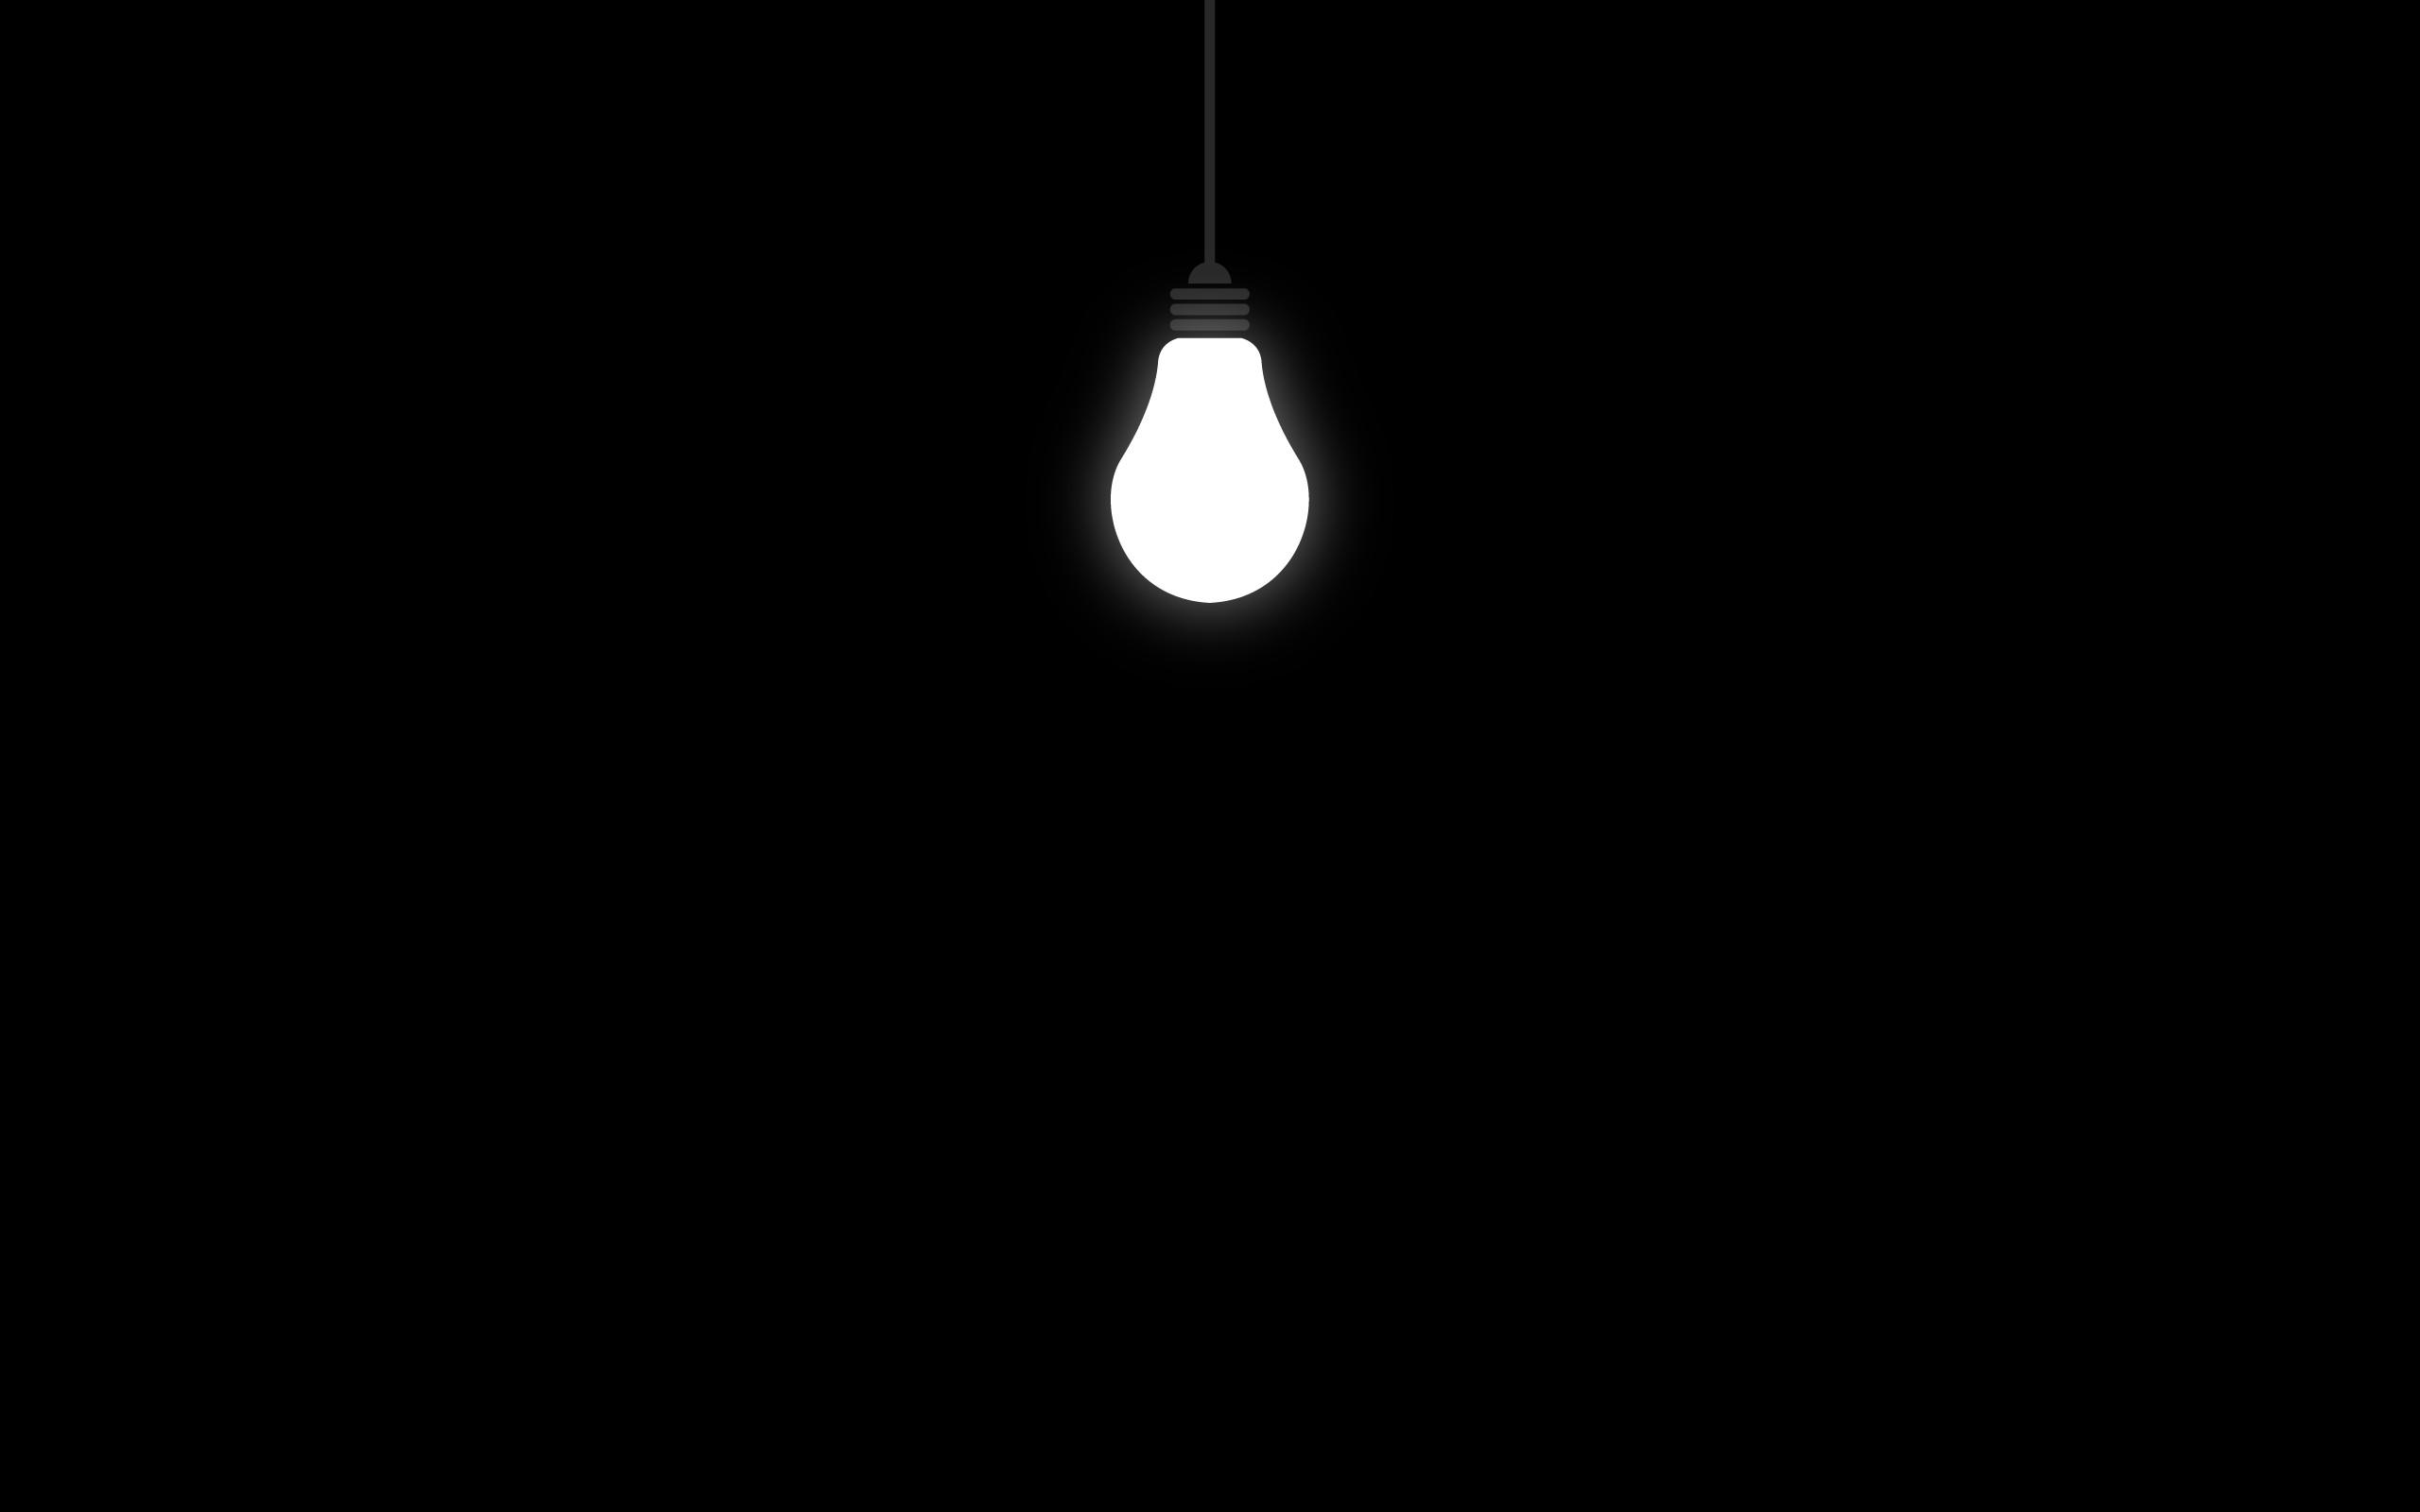 Best 25+ Black desktop background ideas on Pinterest | Black canvas, Deer  head silhouette and Flat lay